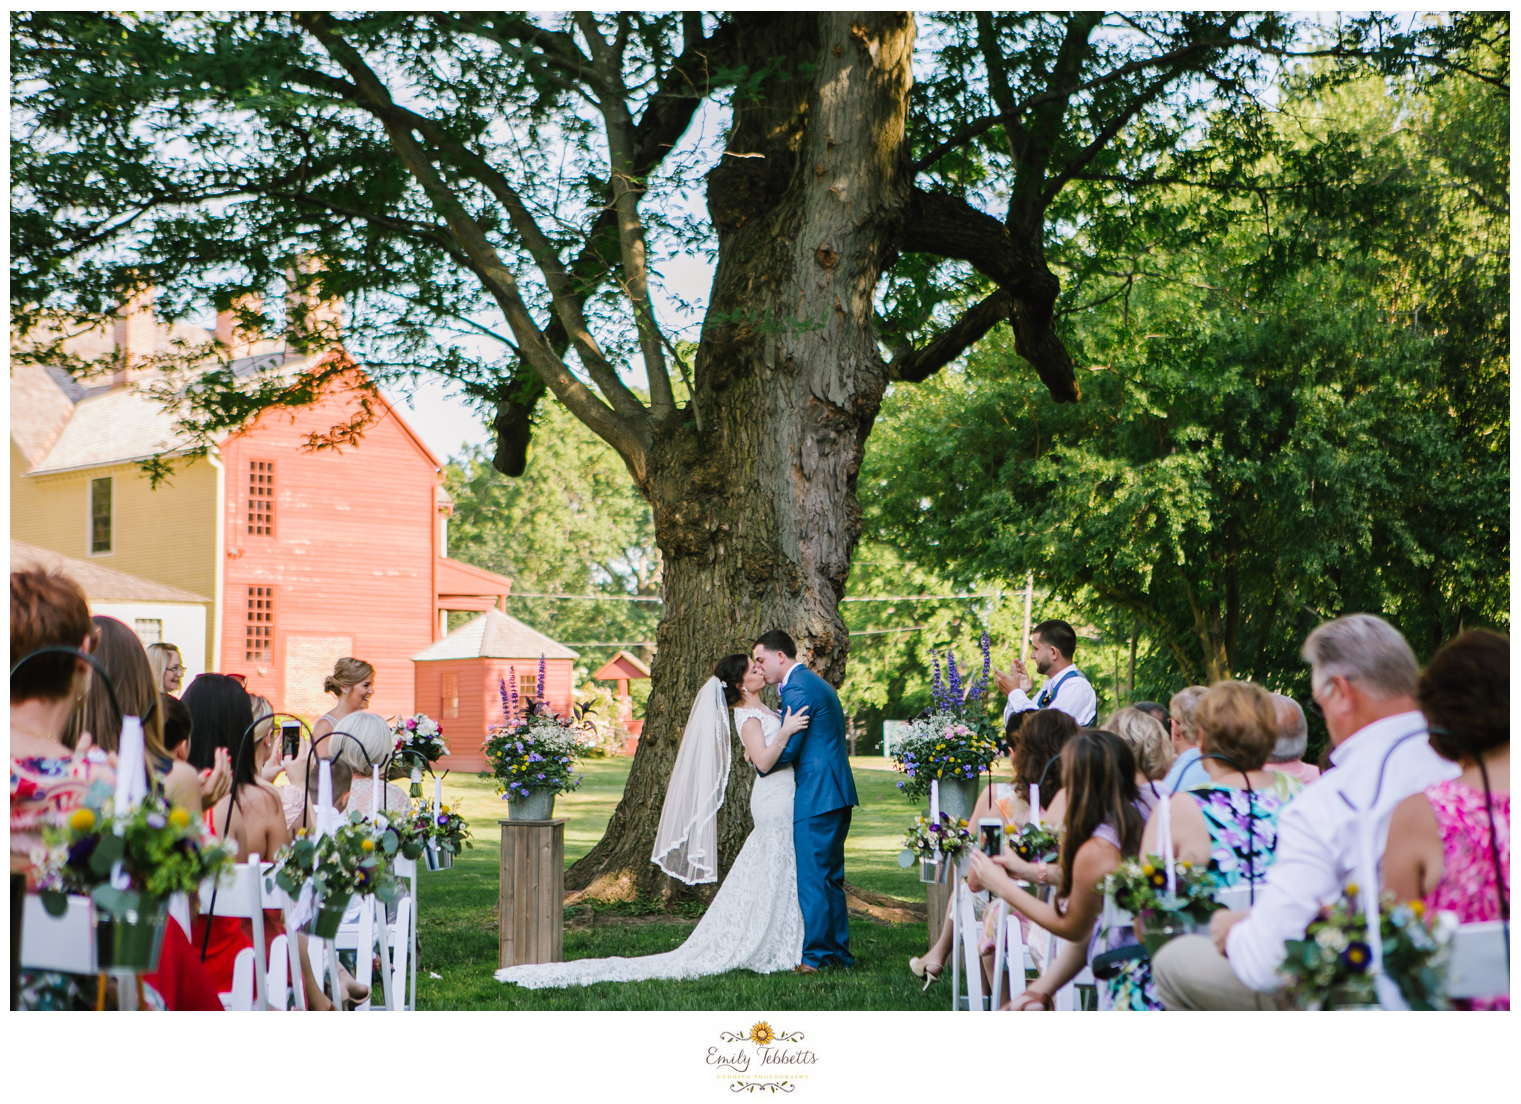 Emily Tebbetts Photography - Kara and Milton Wedding rustic chich Webb Barn Wethersfield CT connecticut-1.jpg